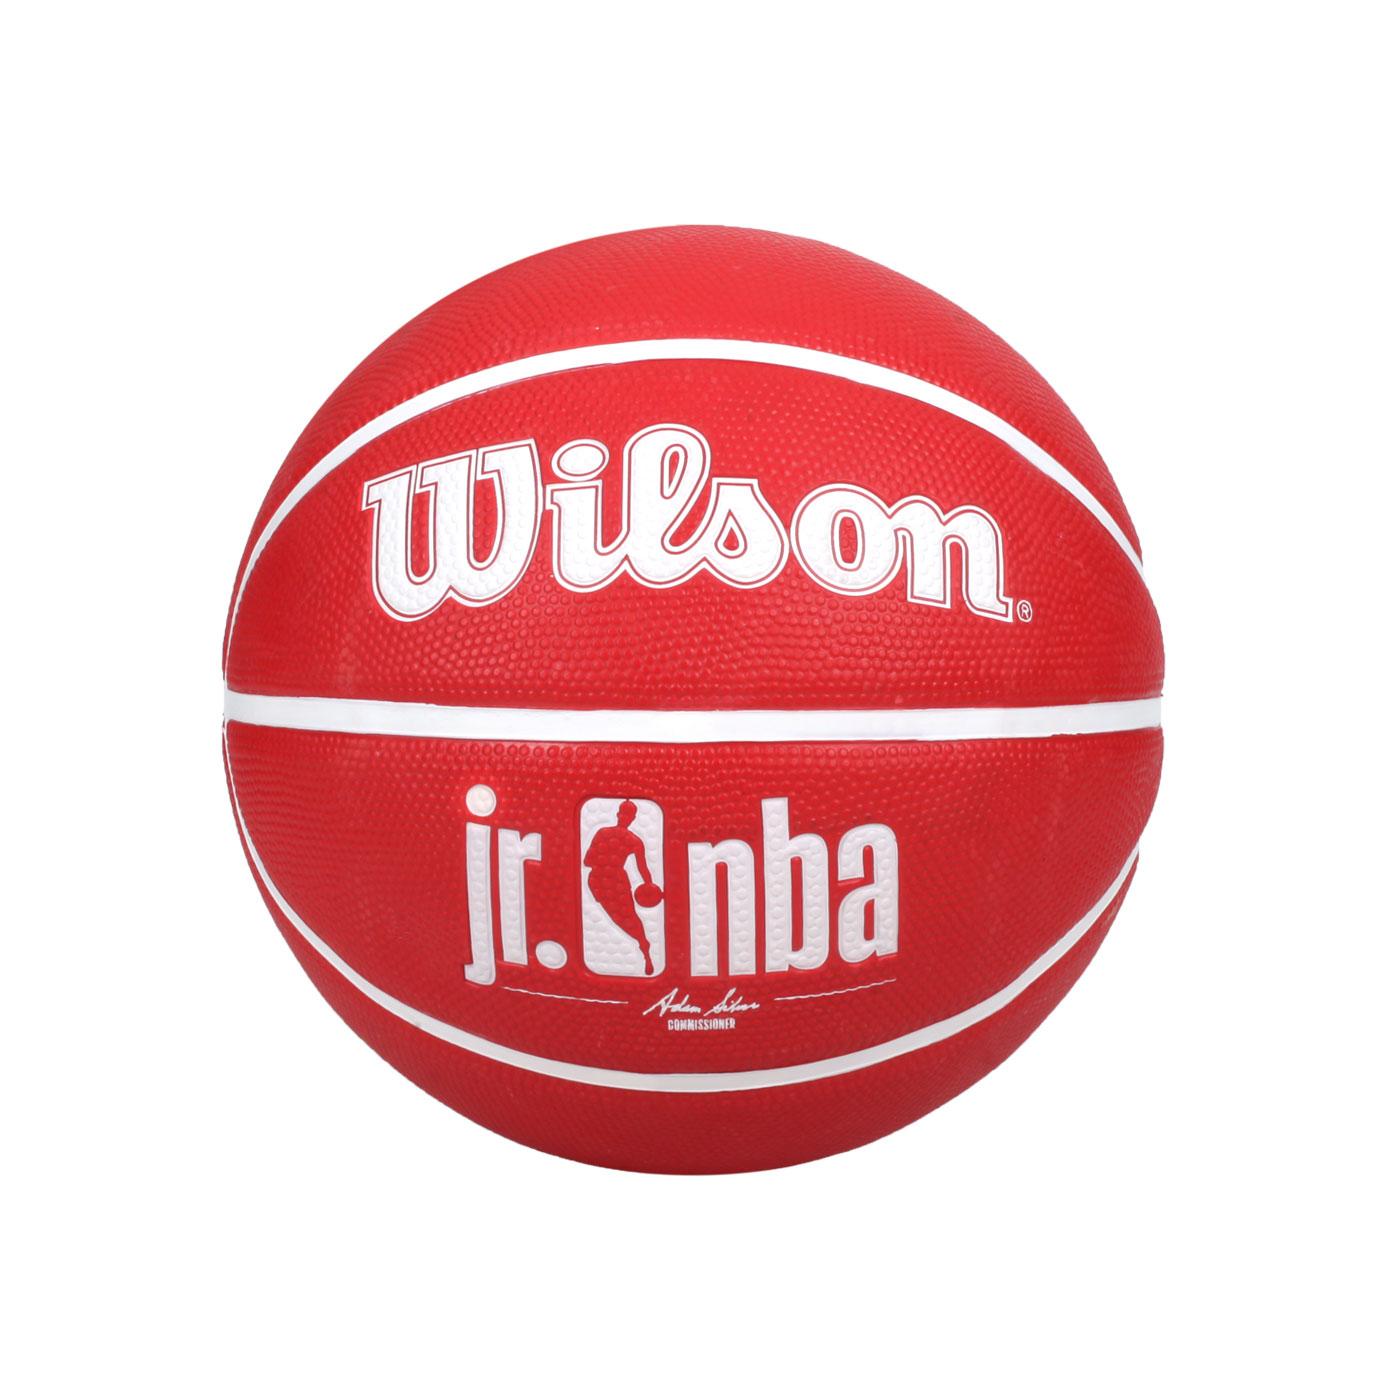 WILSON JR NBA DRV系列橡膠籃球#5 WTB9501XB05